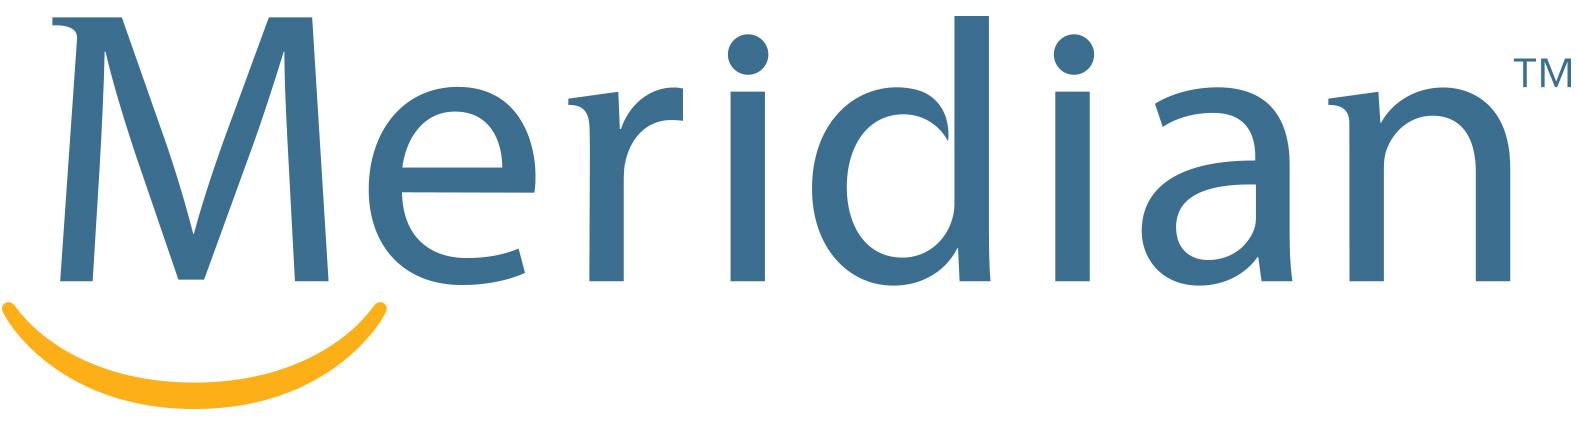 Meridian Logo (1).jpg